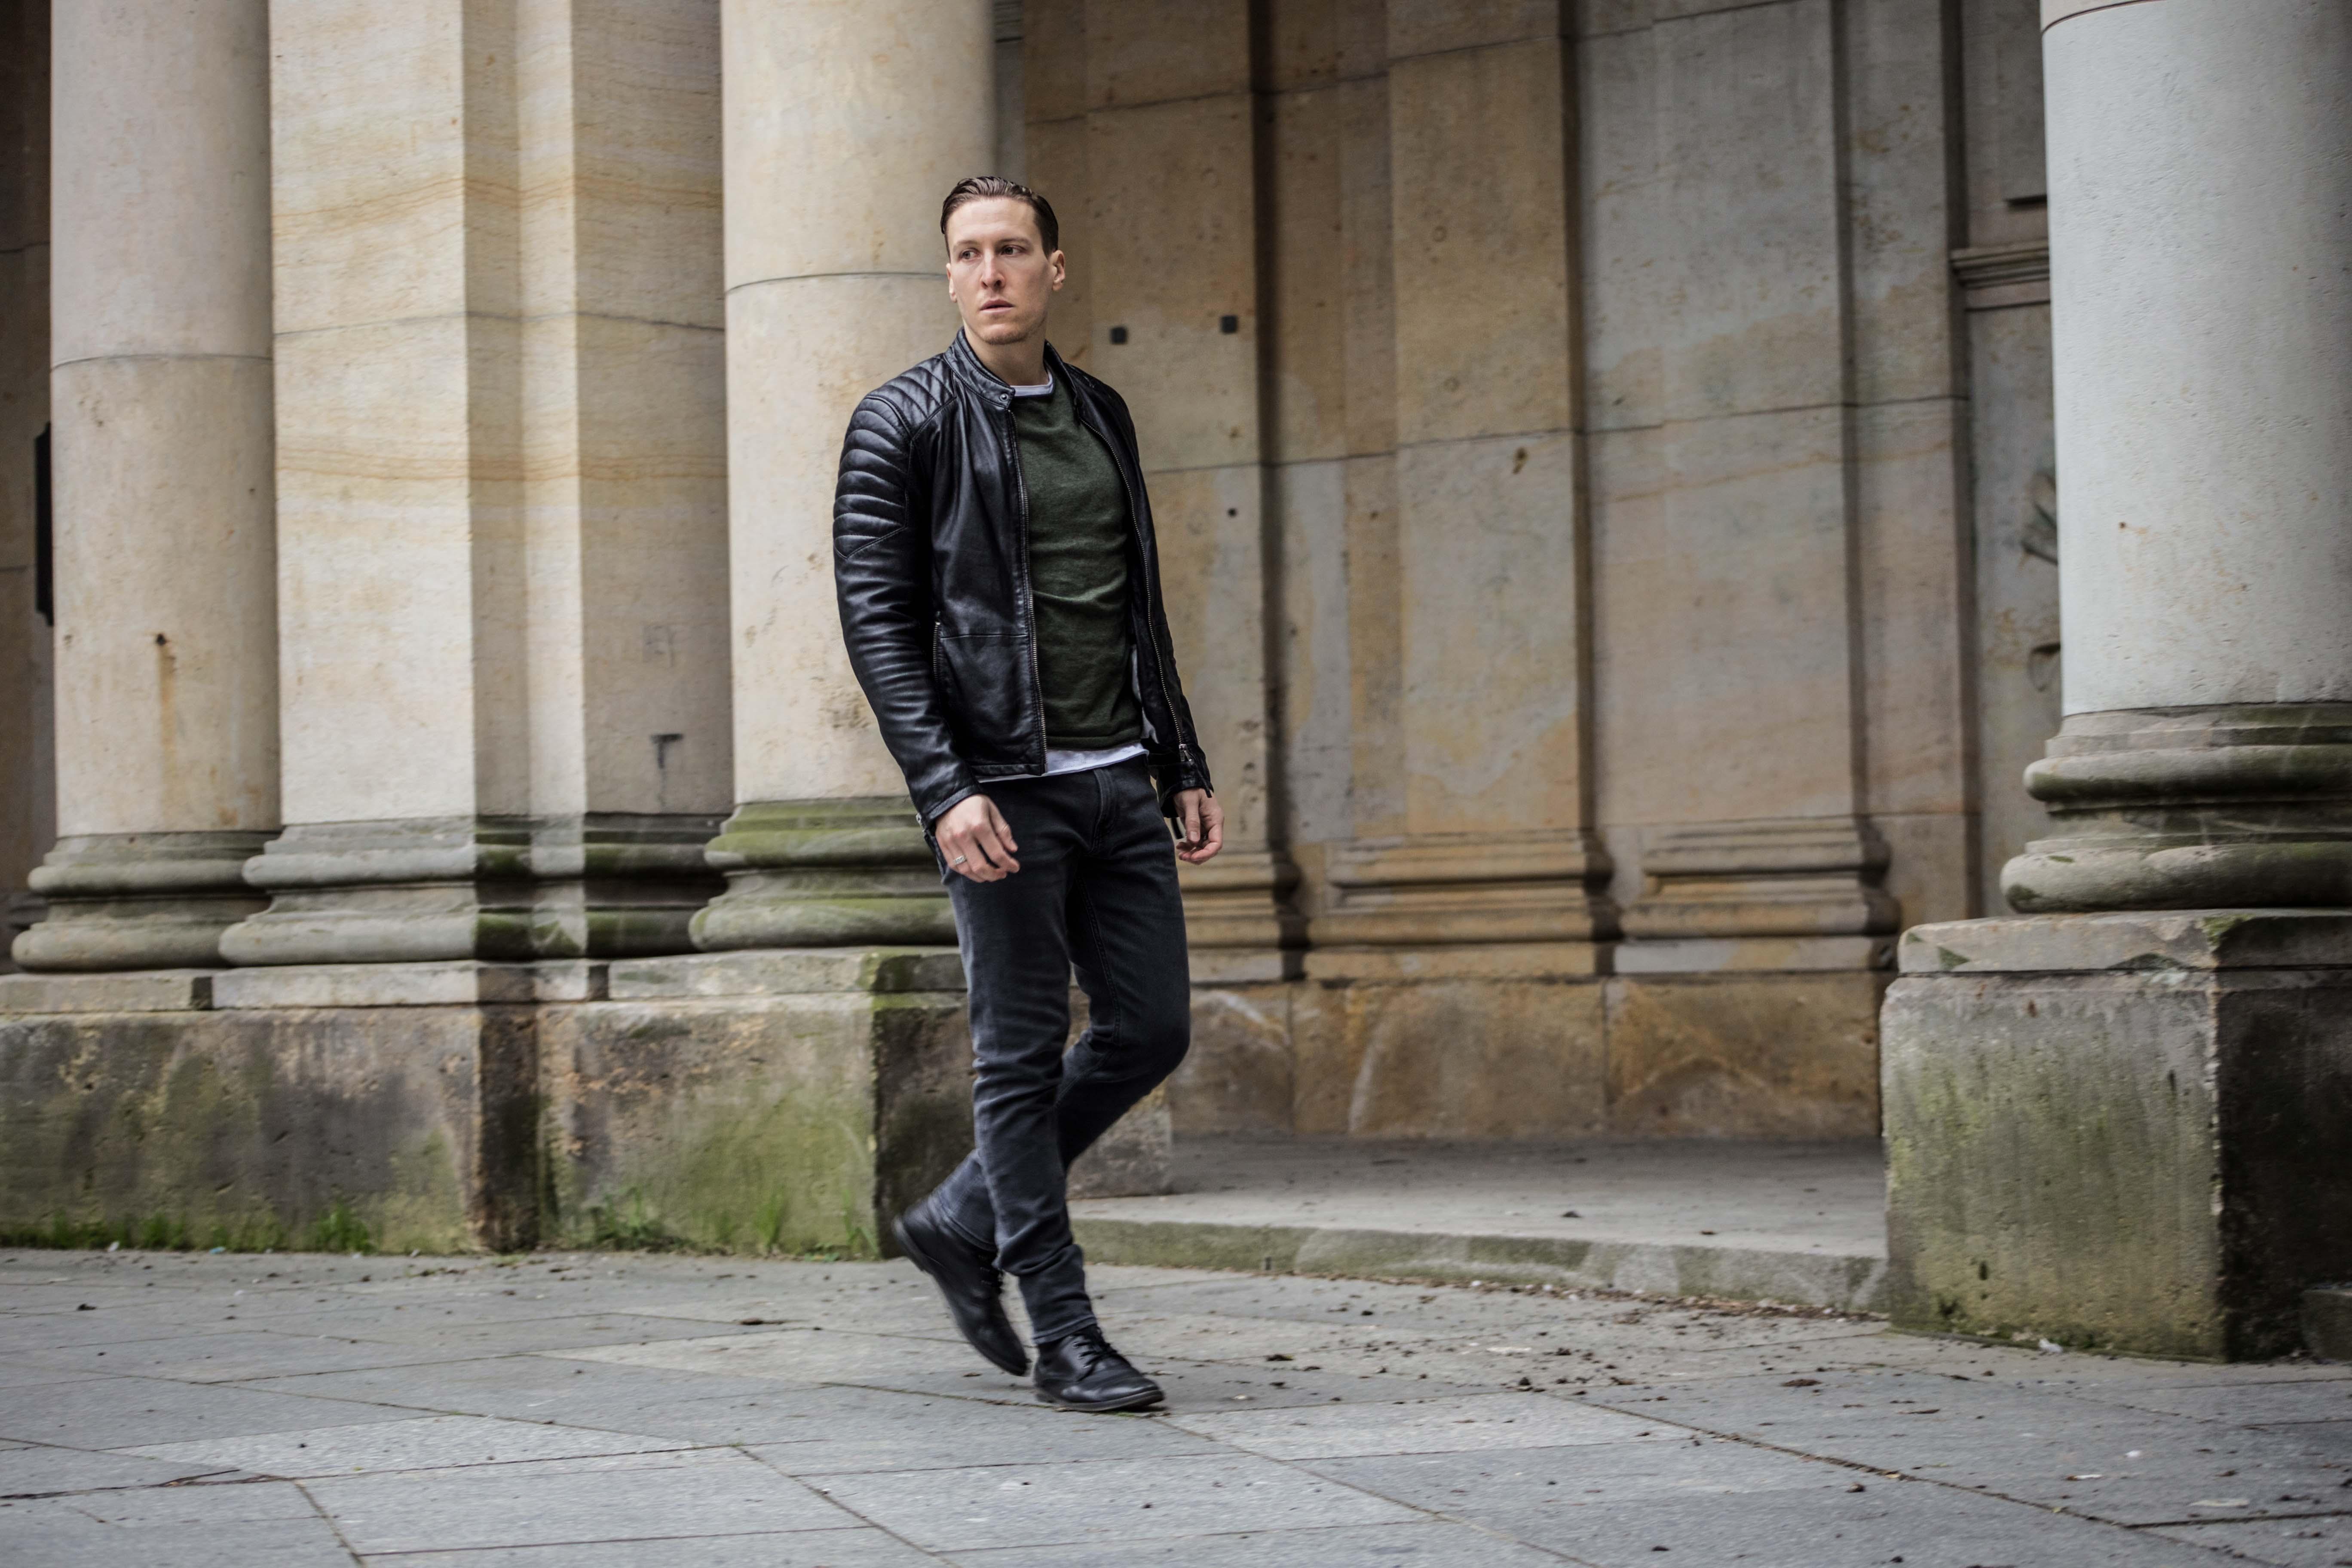 lederjacke-gipsy-frühlingslook-fashion-modeblog-grünes-sweatshirt_6147